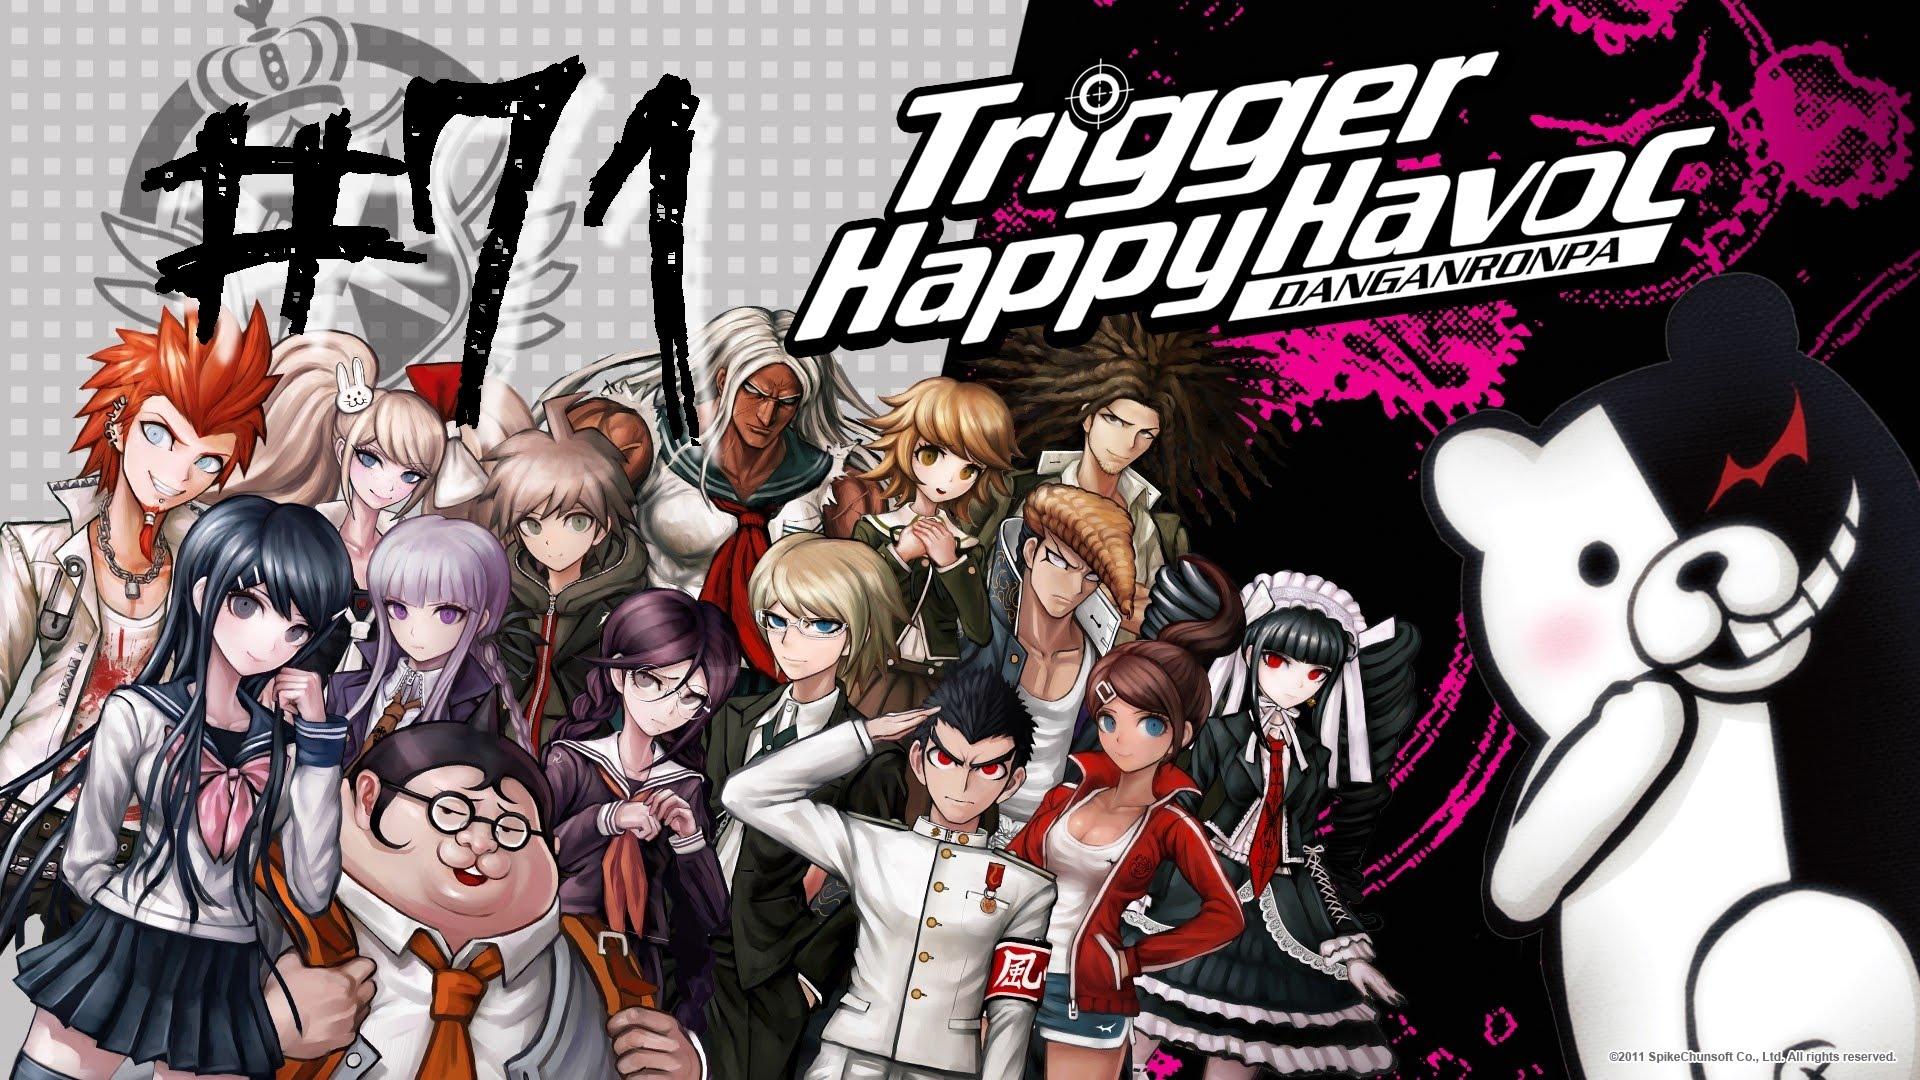 Danganronpa: Trigger Happy Havoc - What a twist! - Изображение 1